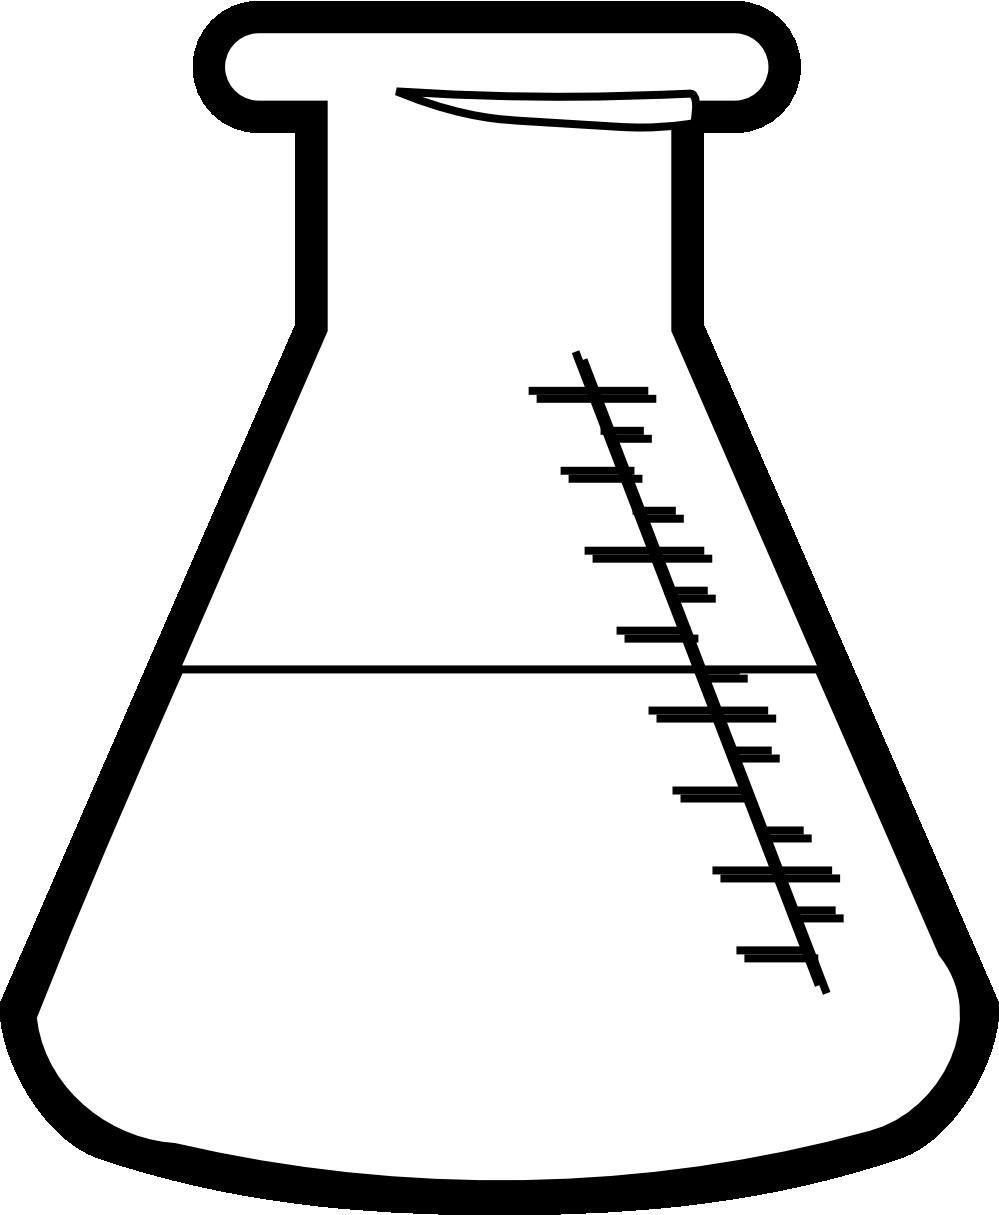 Evaporation clipart beaker. Science drawing at getdrawings